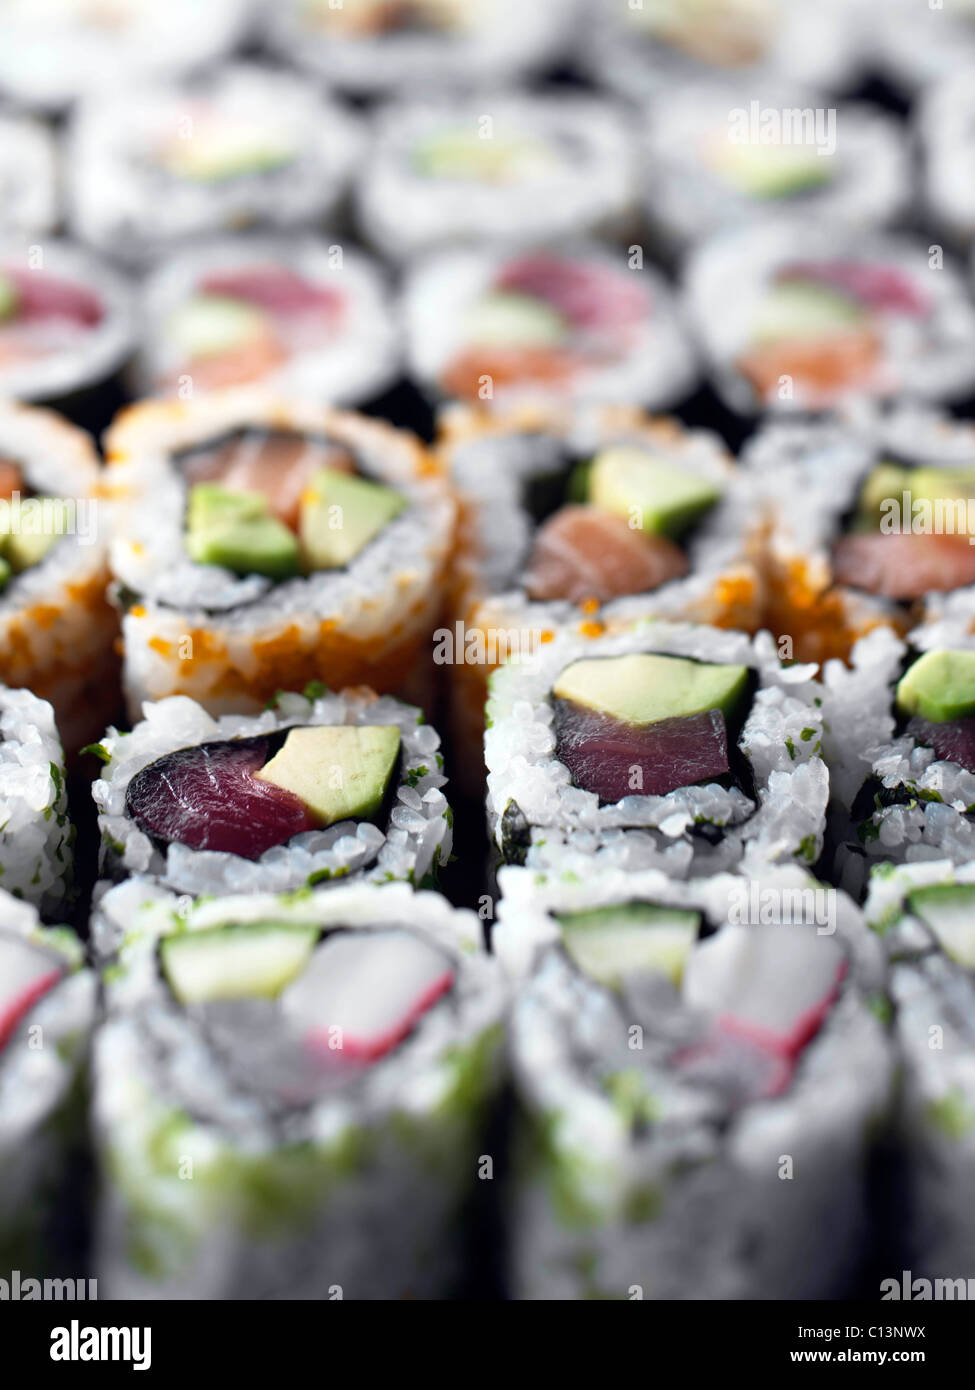 Gesamten Rahmen Sushi japanische Küche Stockfoto, Bild: 35118438 - Alamy